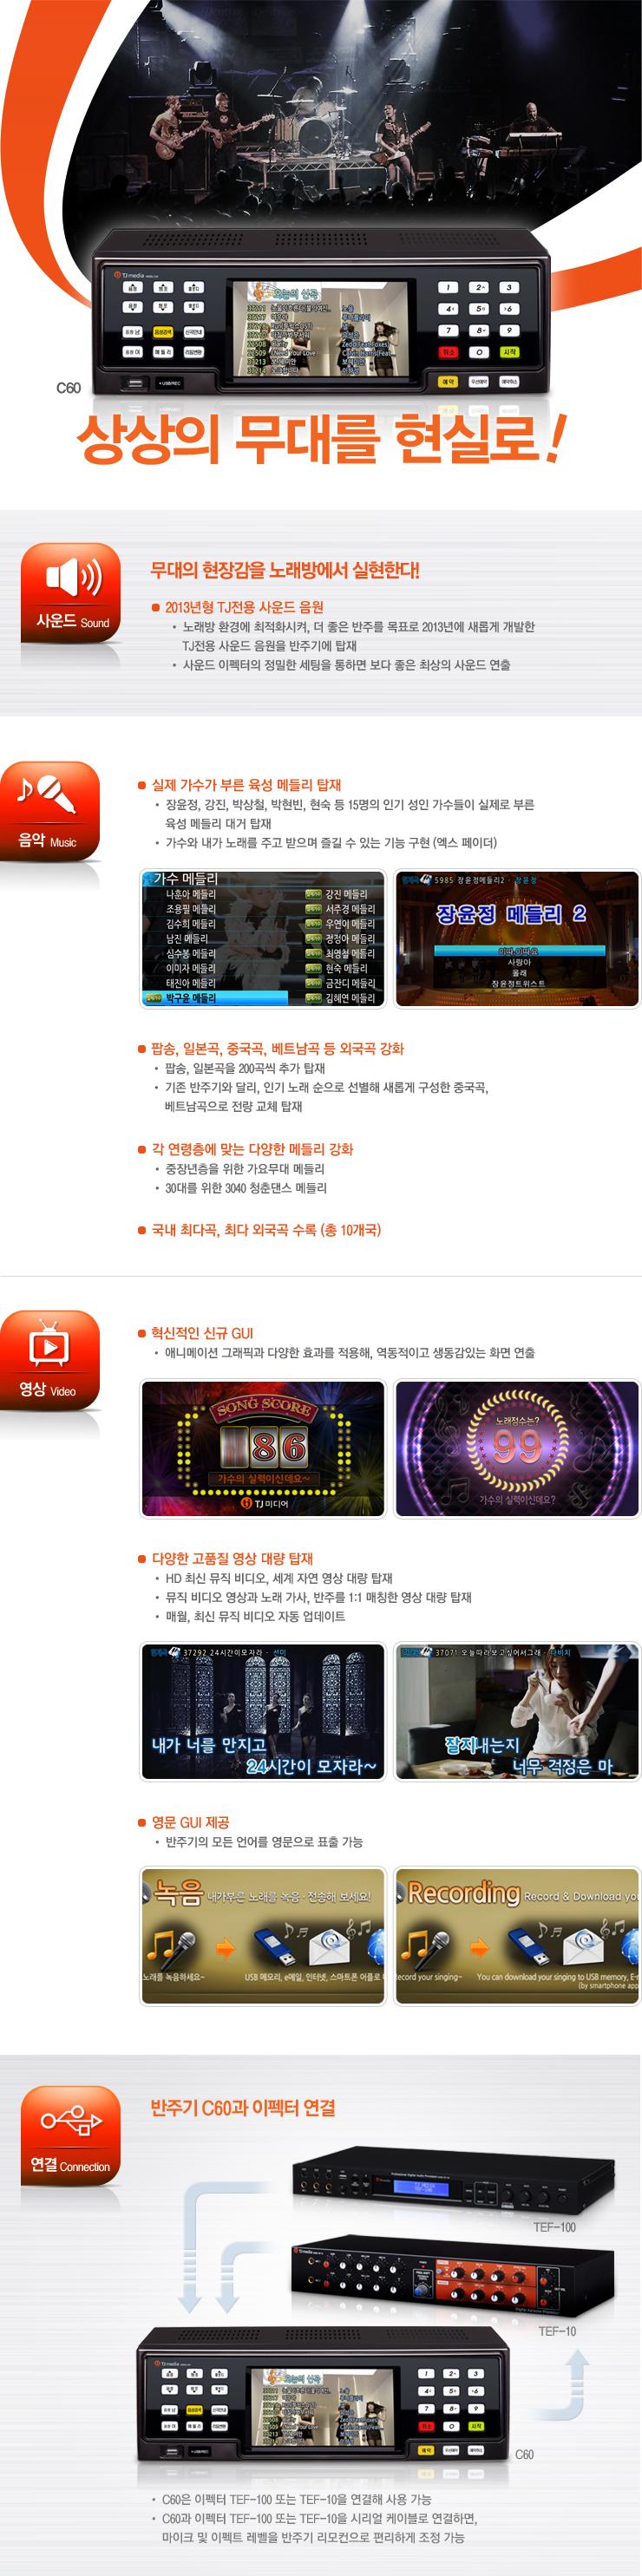 Together & Joy TJ media 제품소개-TJ반주기(C60) Joy